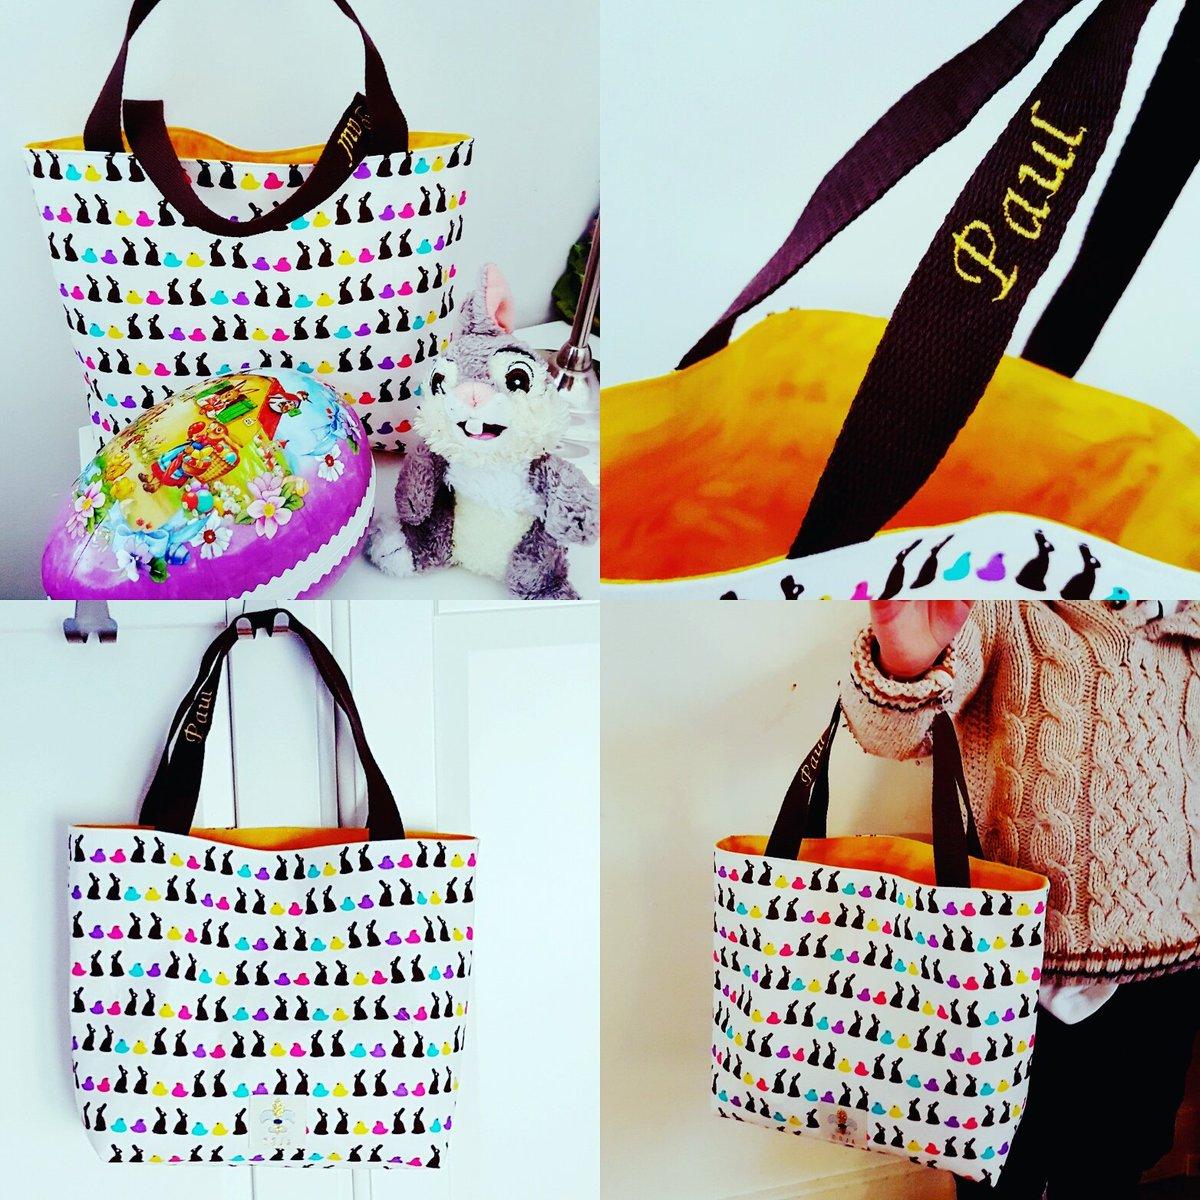 Chasse aux oeufs #madeinFrance #artisan #mojahomemade #handmade #handmade #pâques #sac #paul #personnalisation #enfant #cadeau #chocolat<br>http://pic.twitter.com/P99PbhOmqN